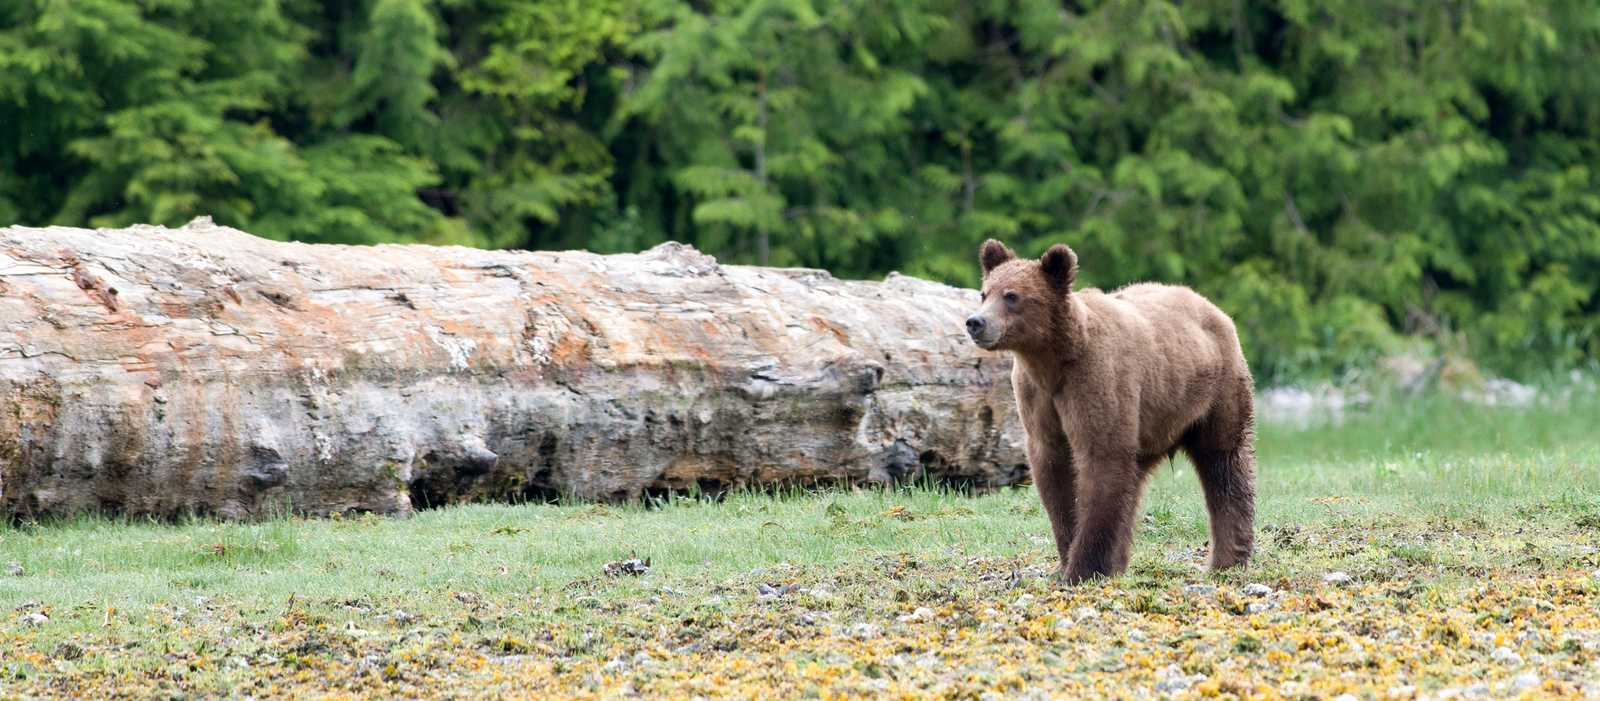 Bär beobachtet beim Kingfisher Wilderness Adventure